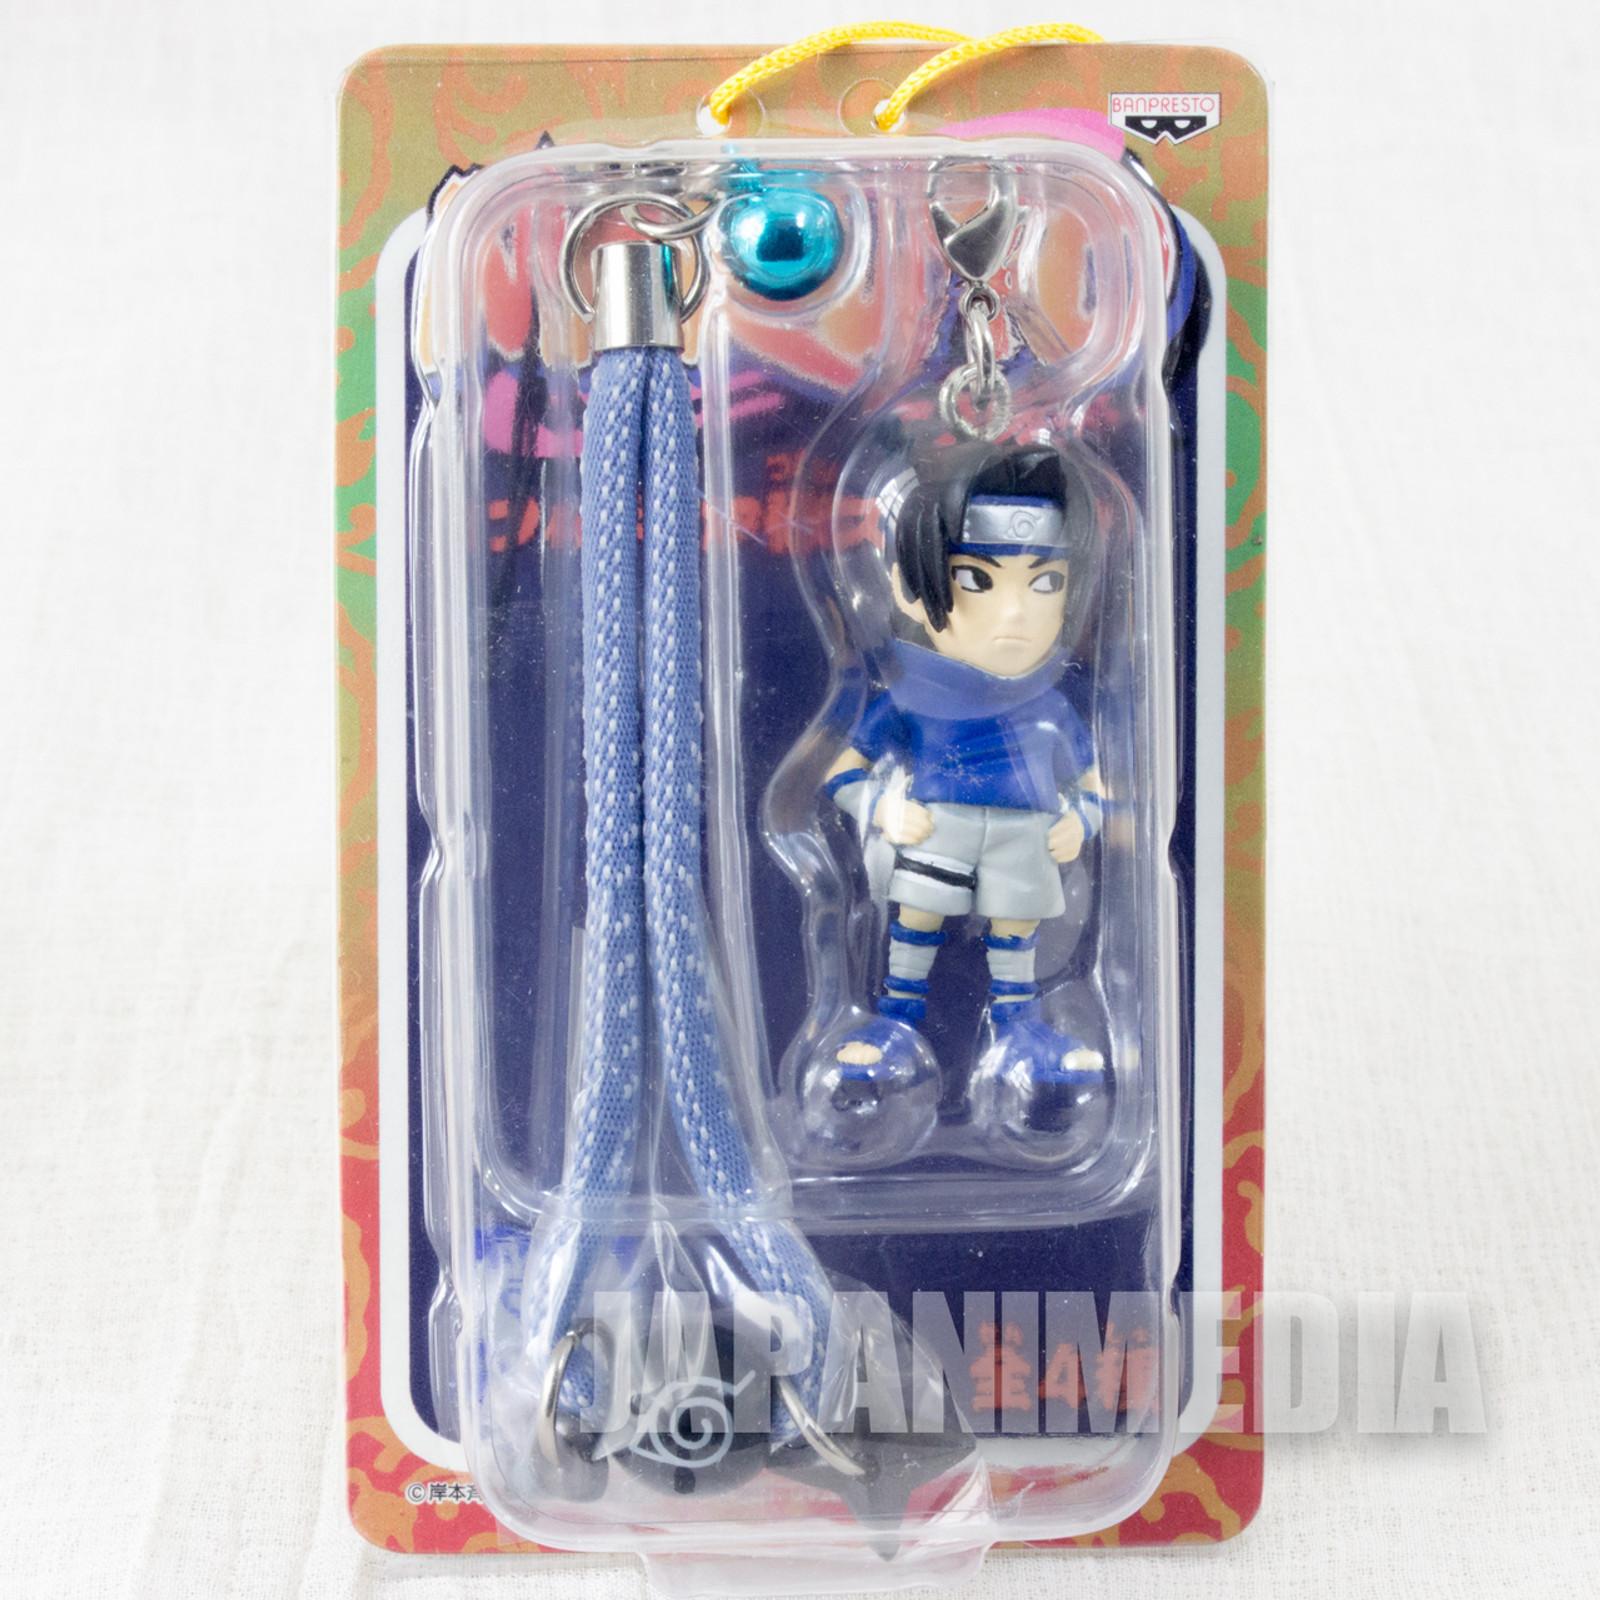 NARUTO Sasuke Uchiha Figure mobile Strap JAPAN ANIME MANGA